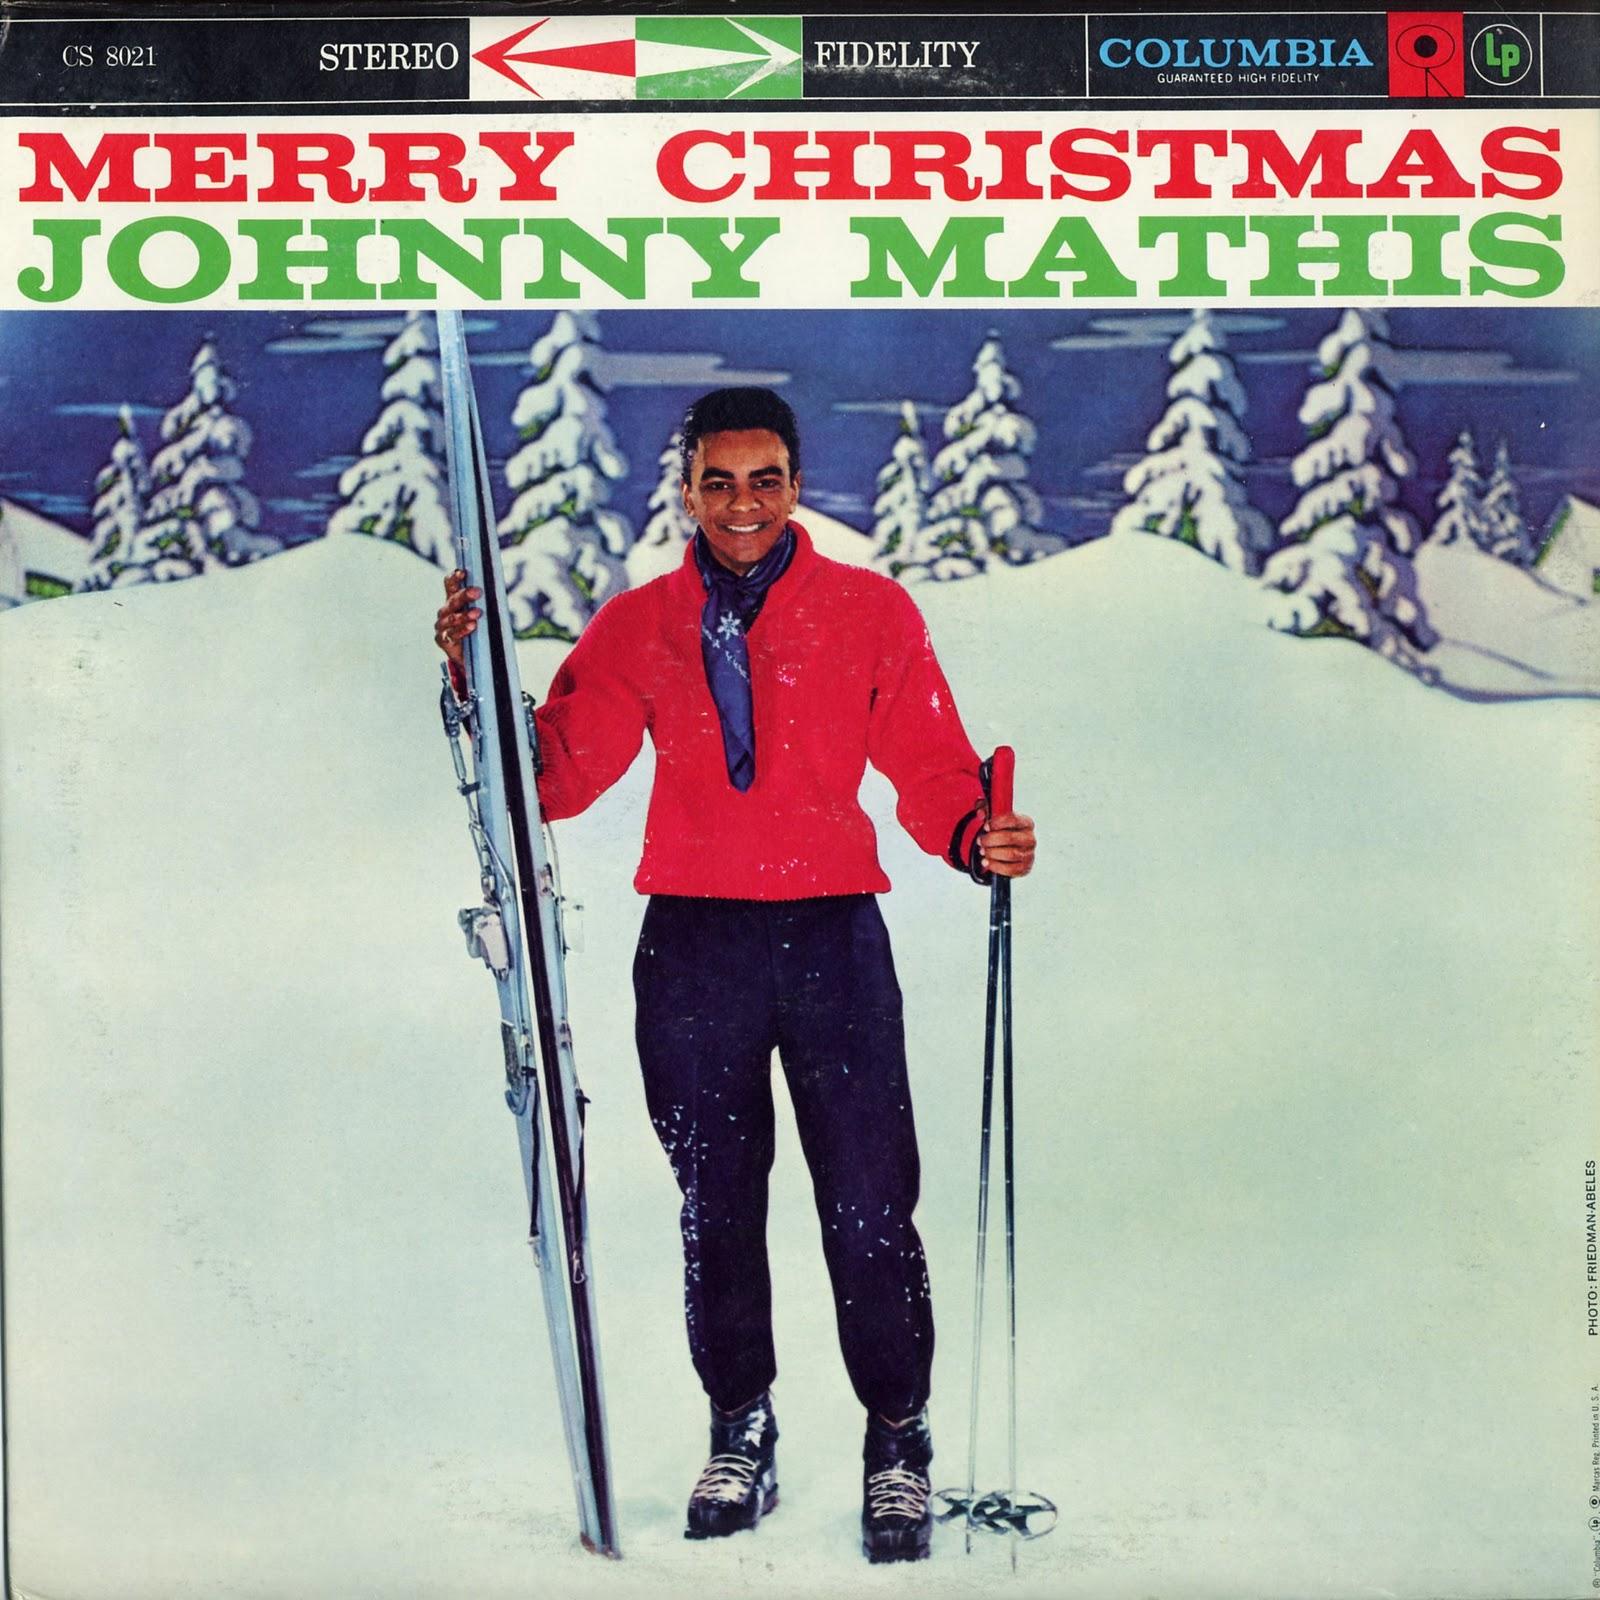 Johnny Mathis Christmas Albums